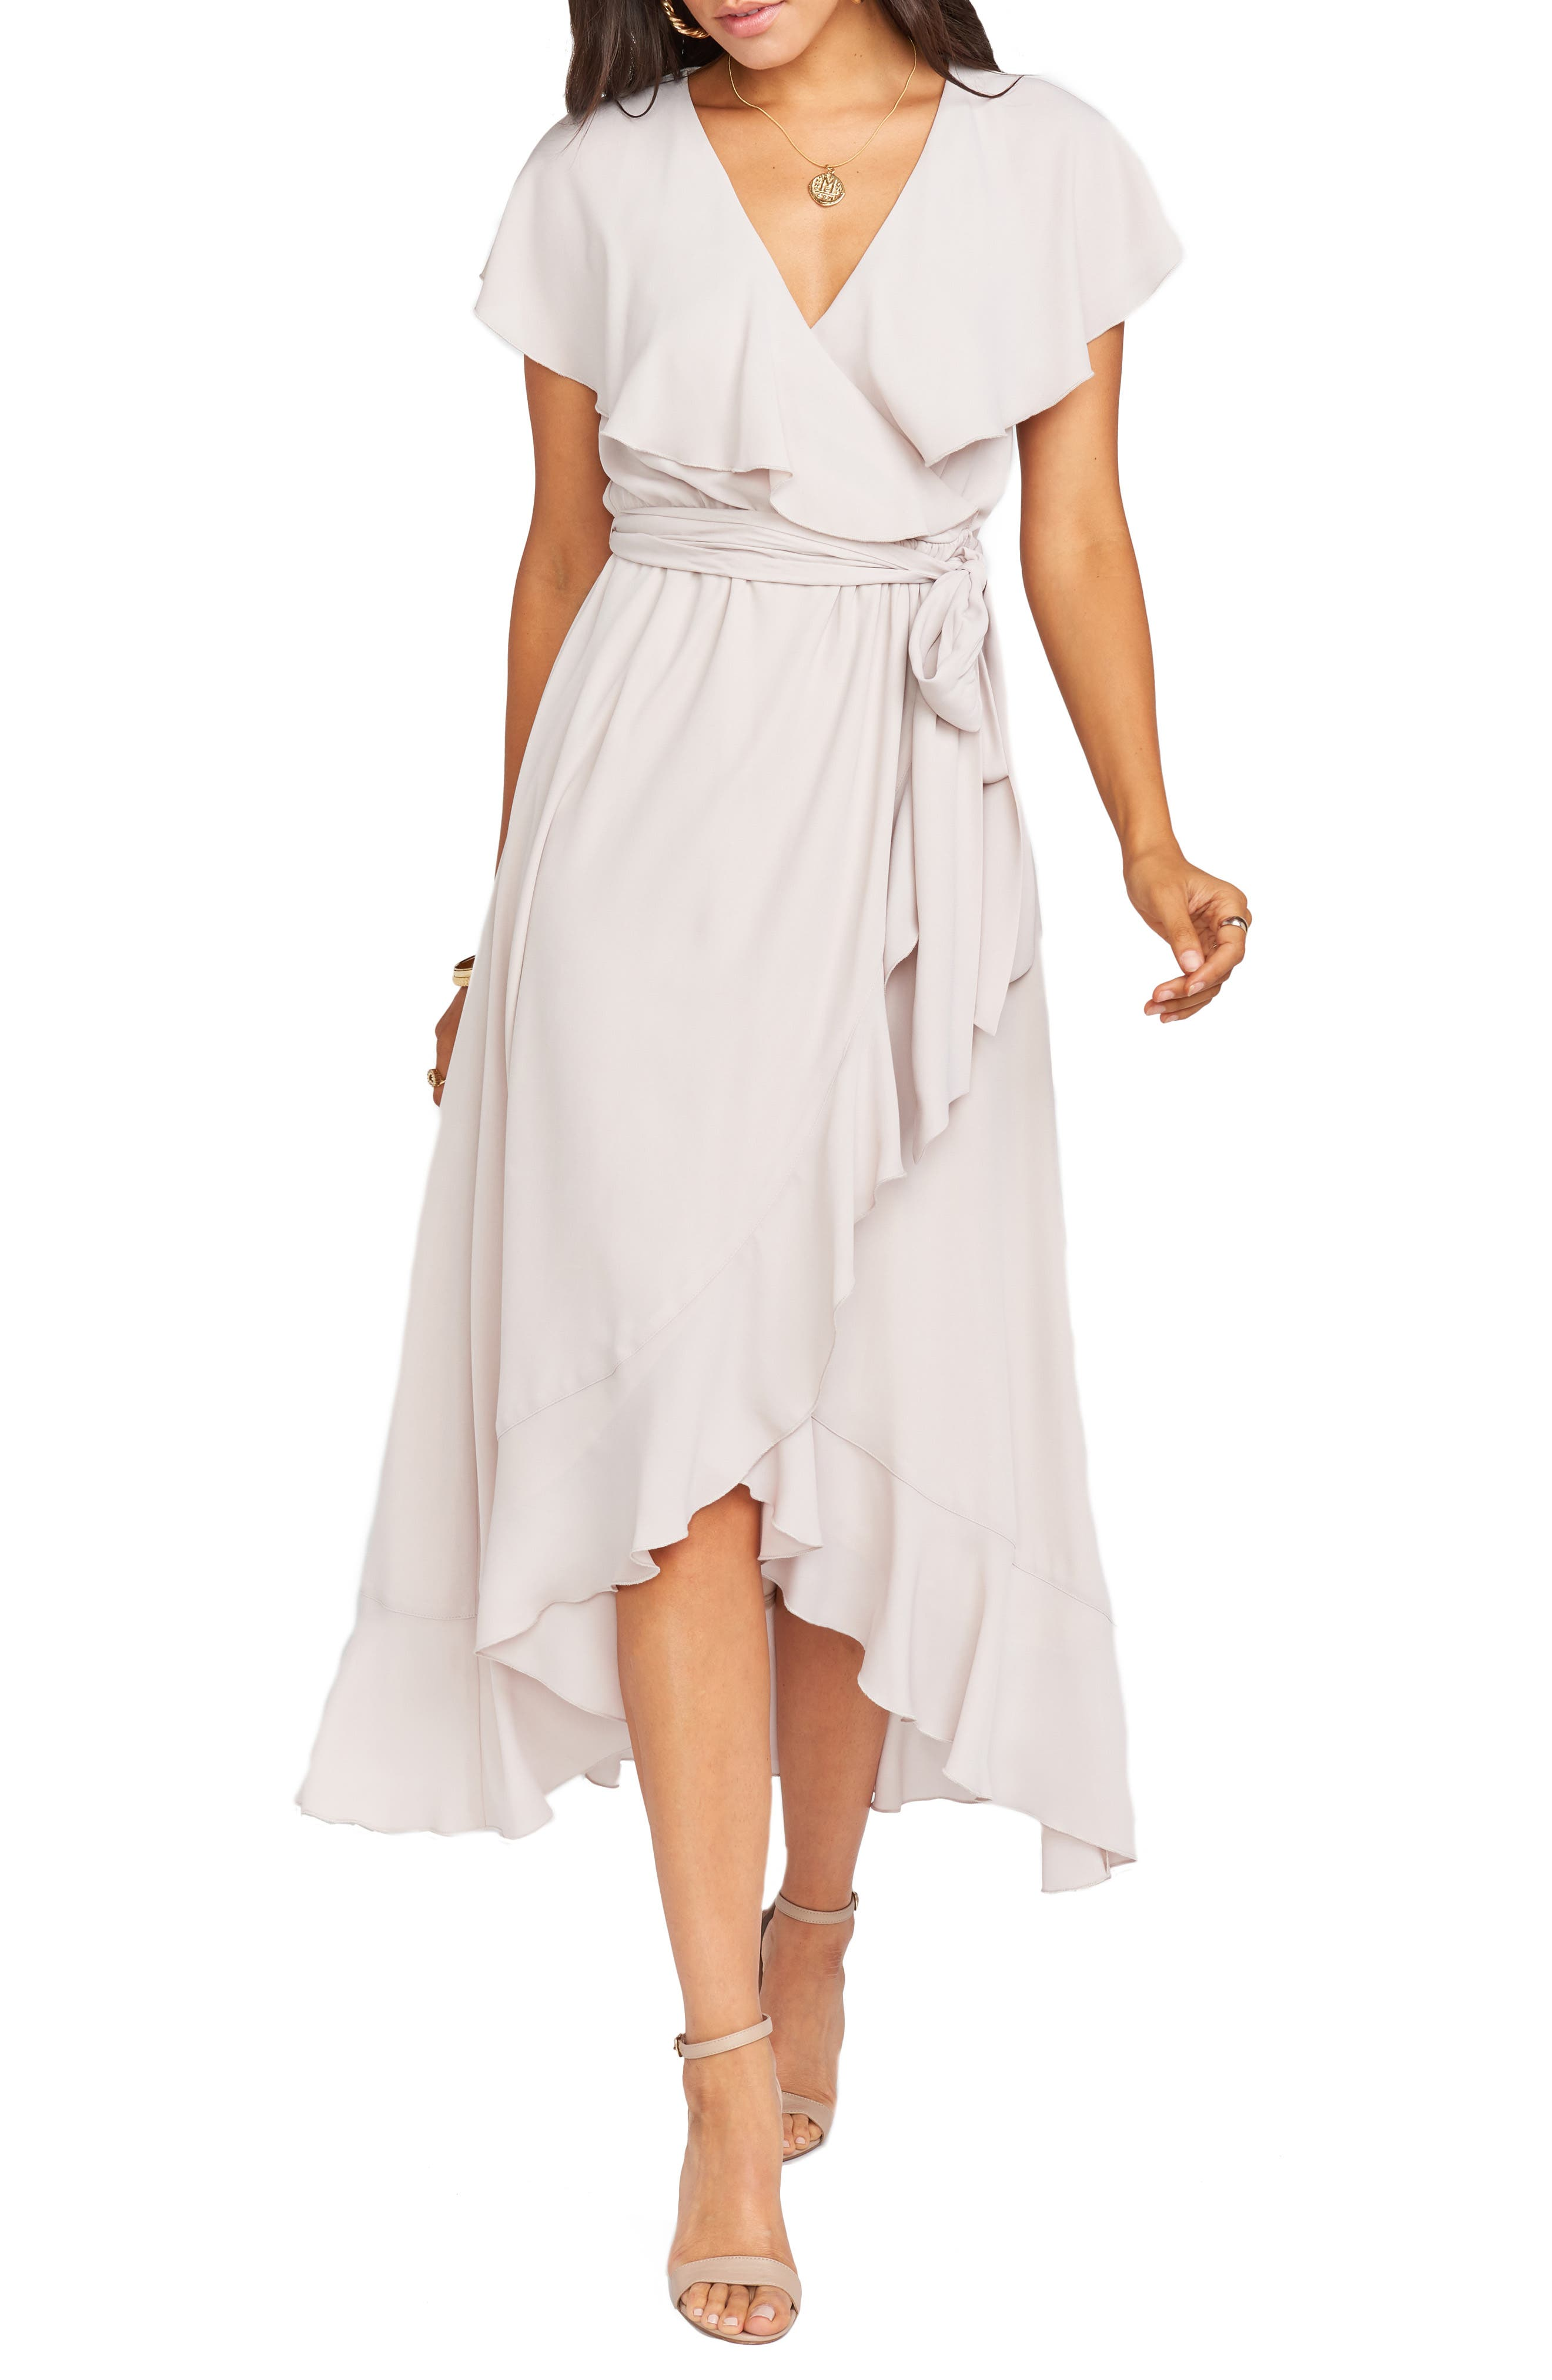 60s Wedding Dresses | 70s Wedding Dresses Womens Show Me Your Mumu Jess Ruffle Maxi Dress Size X-Small - Beige $198.00 AT vintagedancer.com